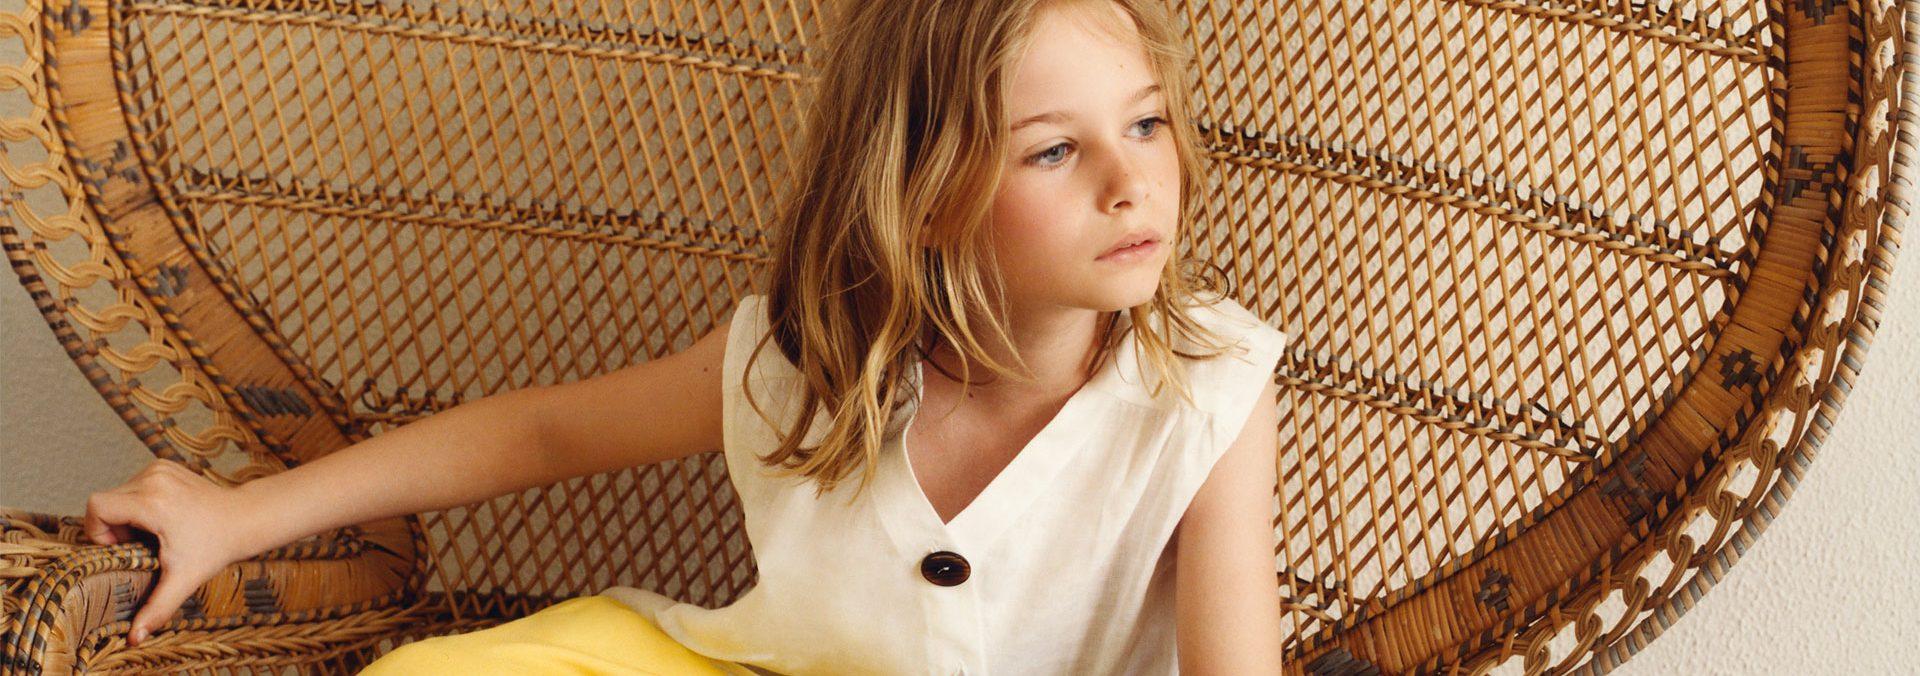 Zara - 20% OFF on Kids' Clothing